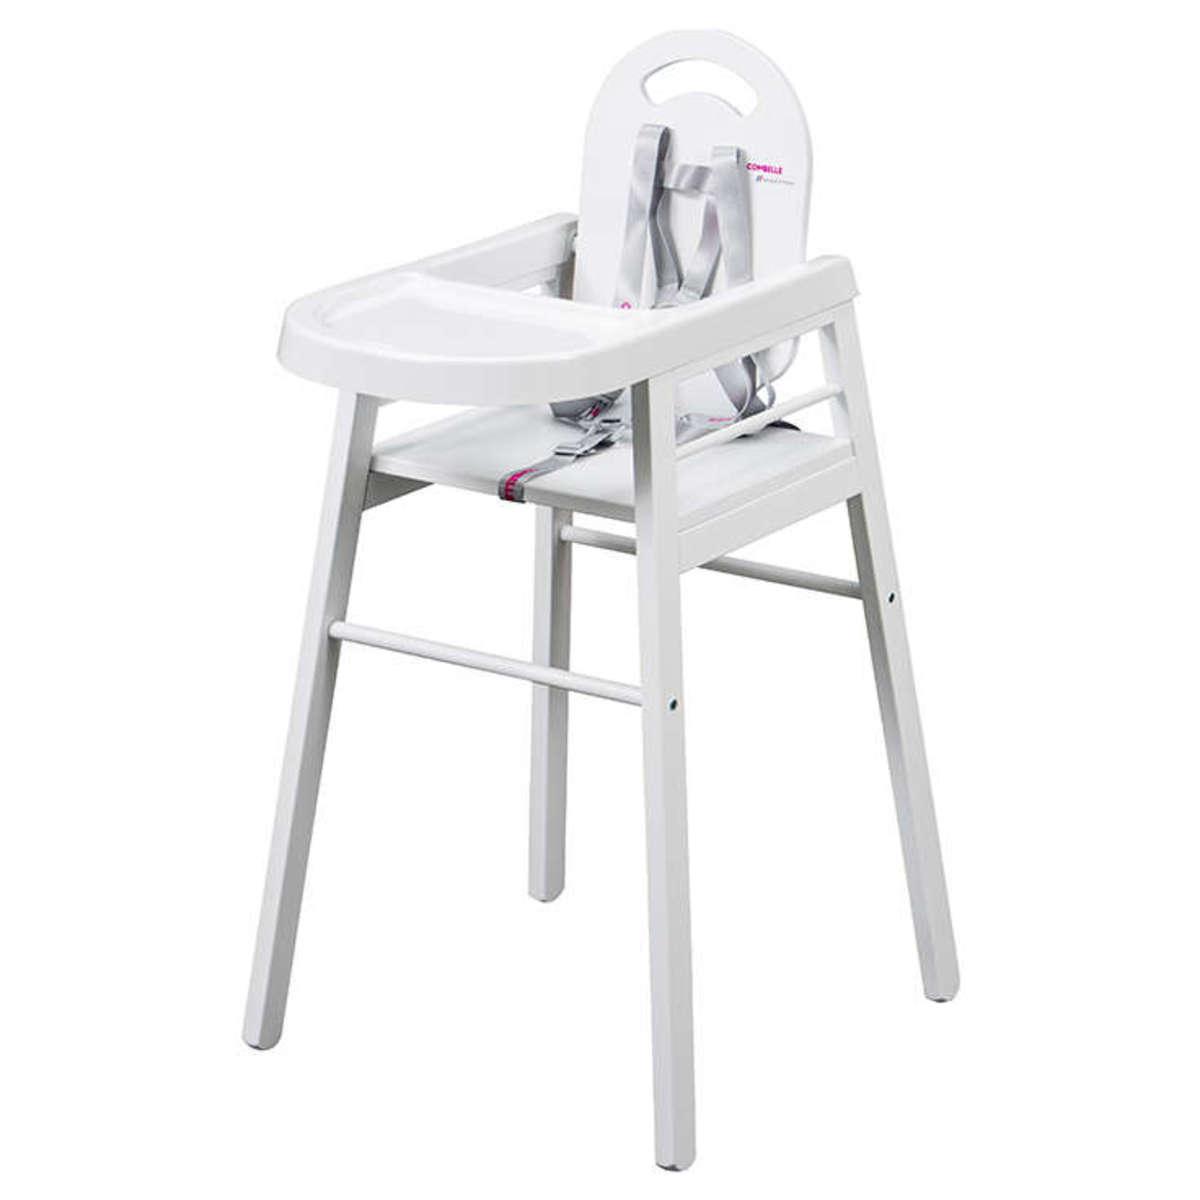 Chaise haute Chaise Haute Fixe Lili - Blanc Chaise Haute Fixe Lili - Blanc